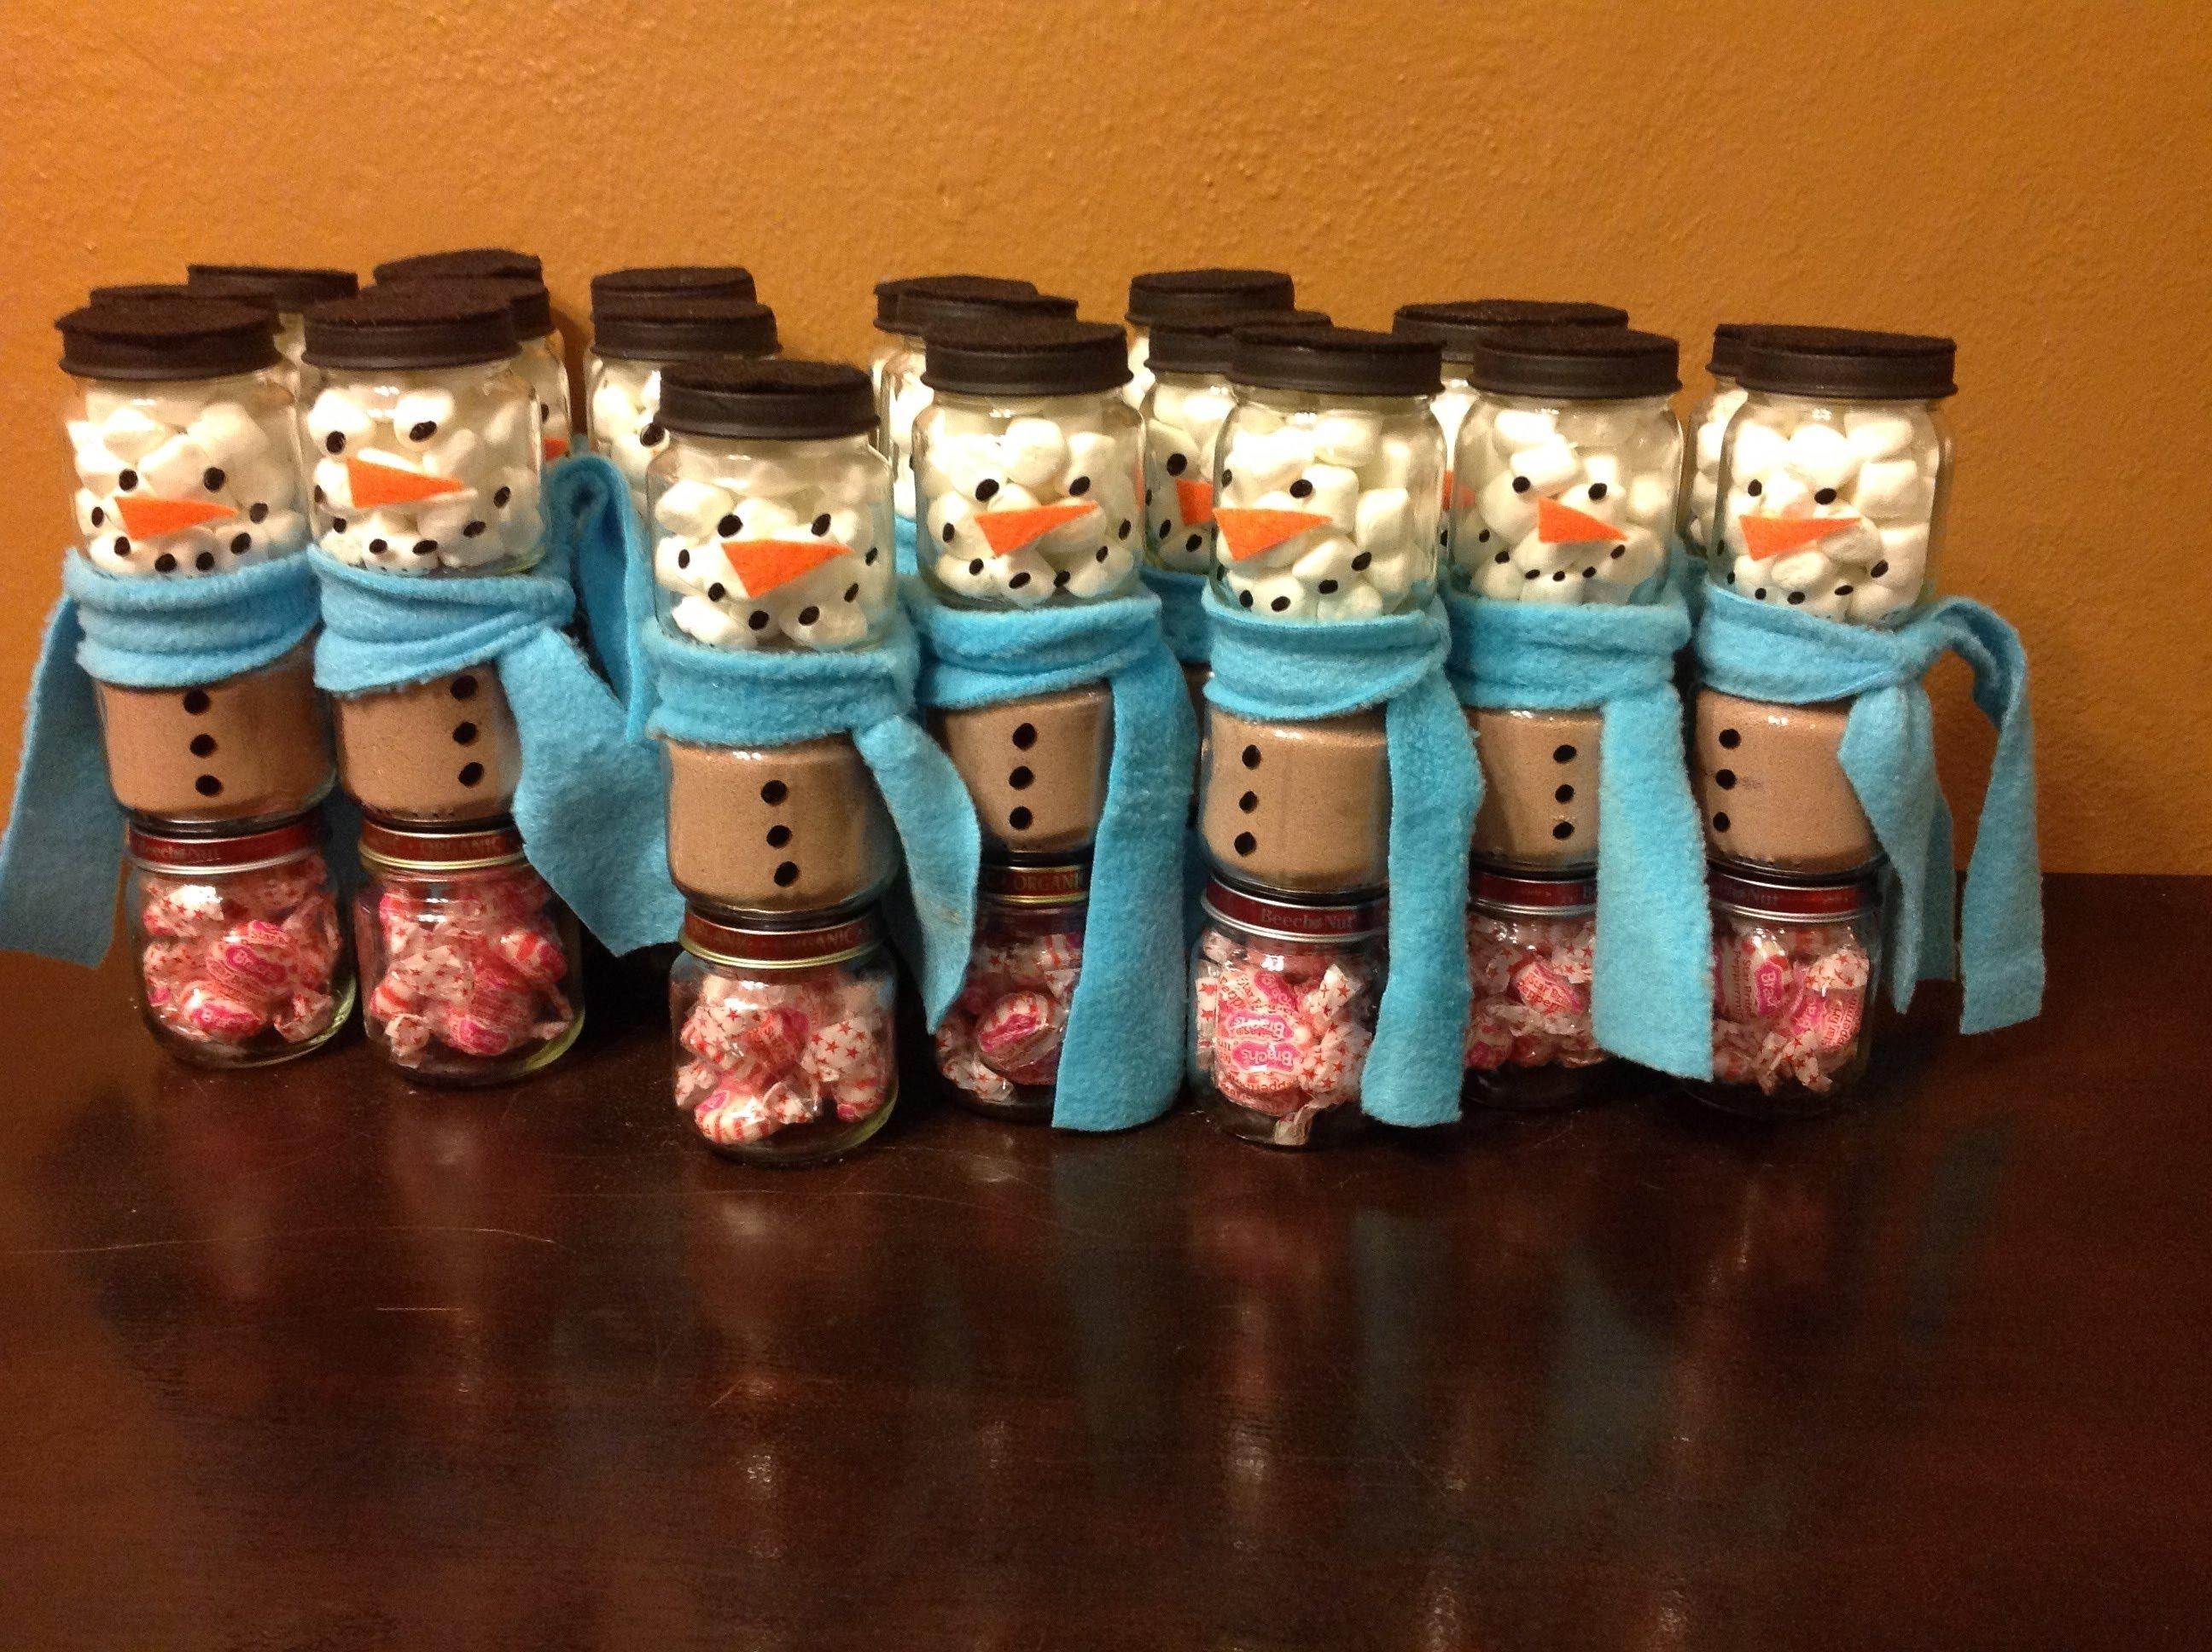 10 Great Craft Ideas For Baby Food Jars diy snowman baby food jars youtube 1 2020